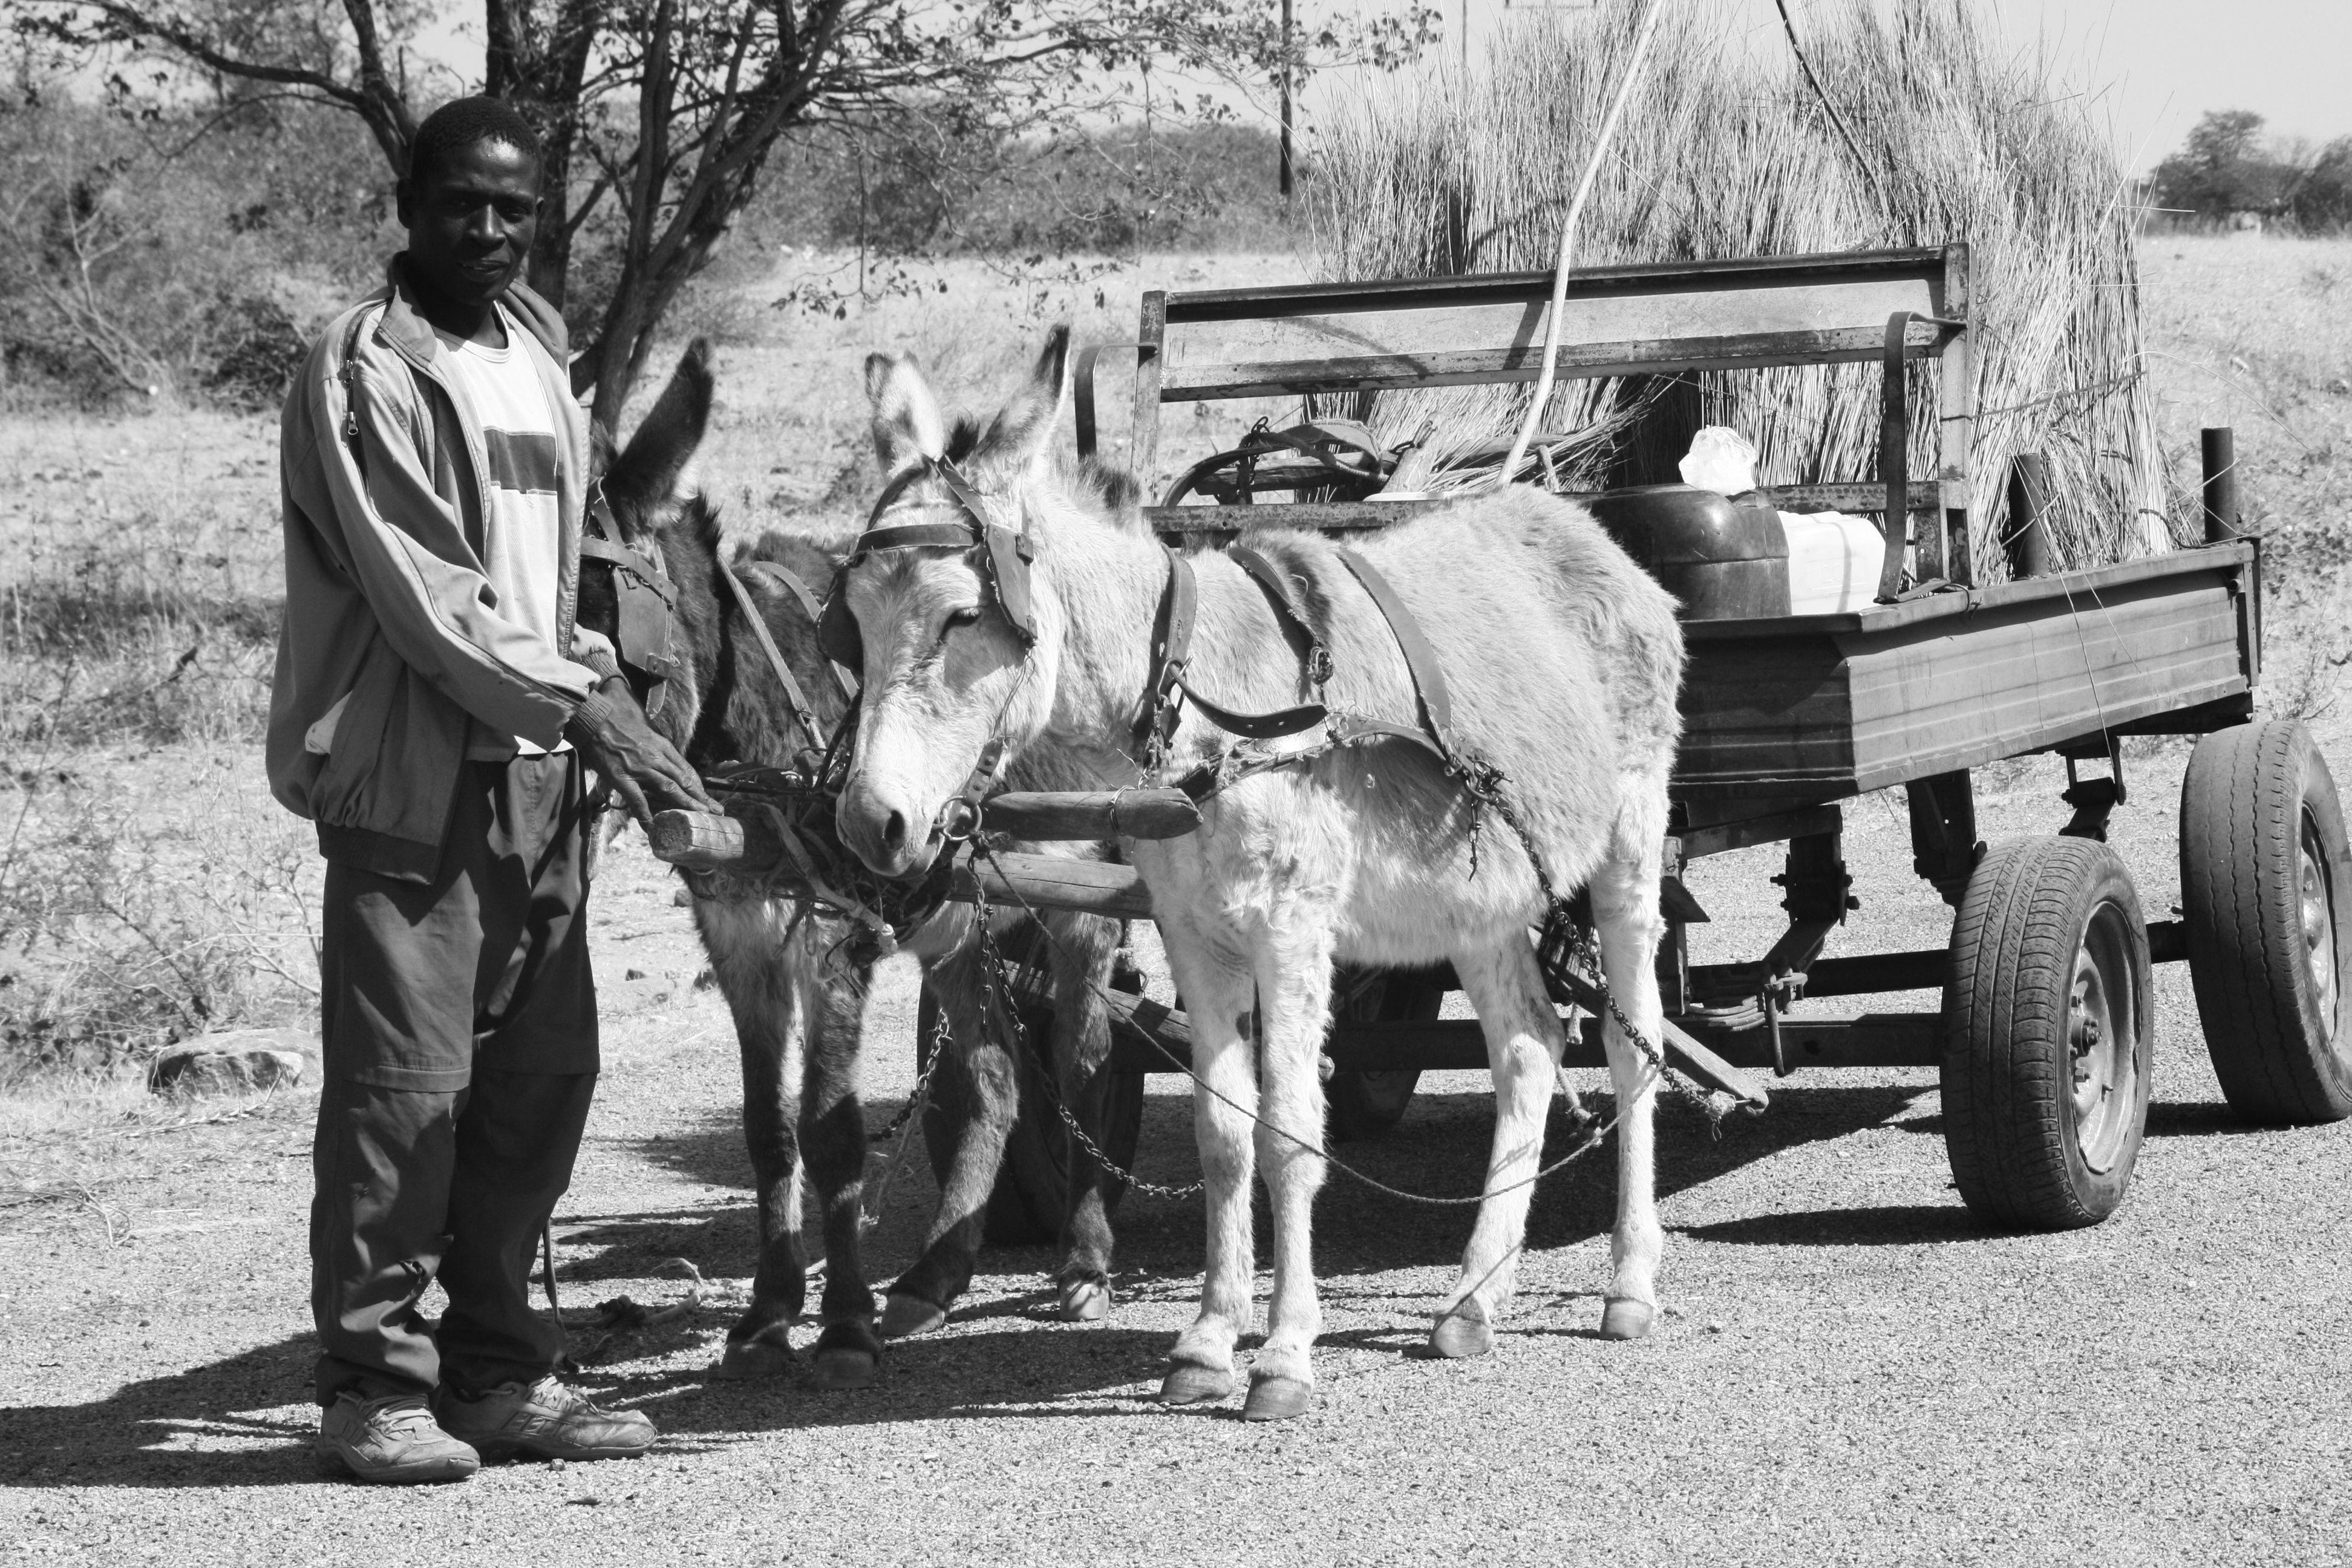 Donkey cart, Tuli Block, Botswana